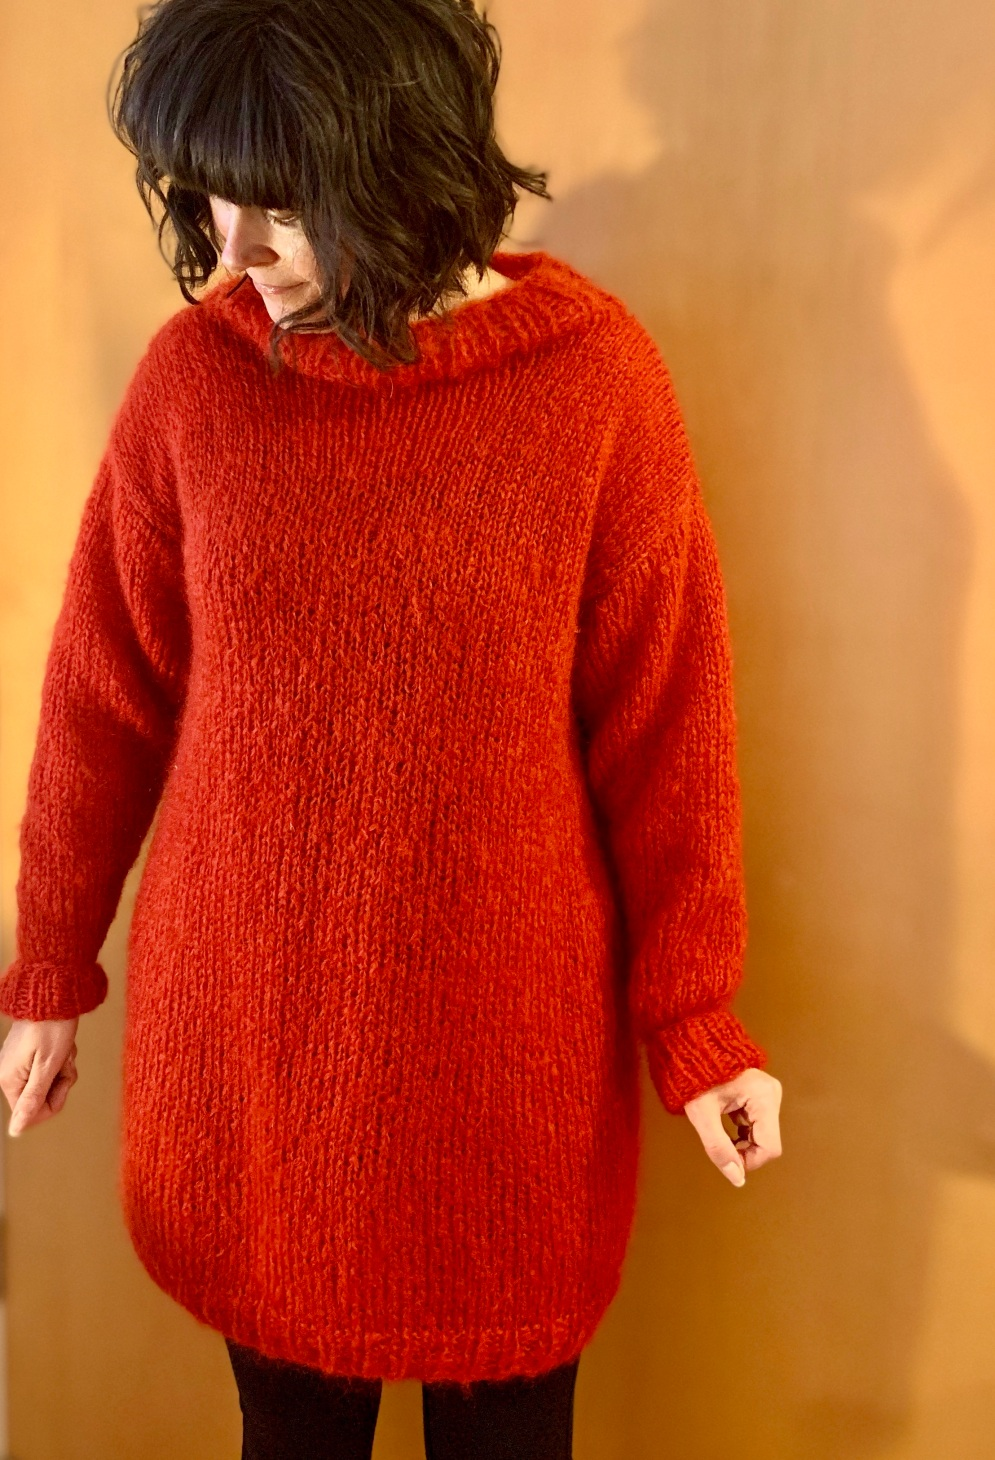 WATG Hotline Sweater lengthened